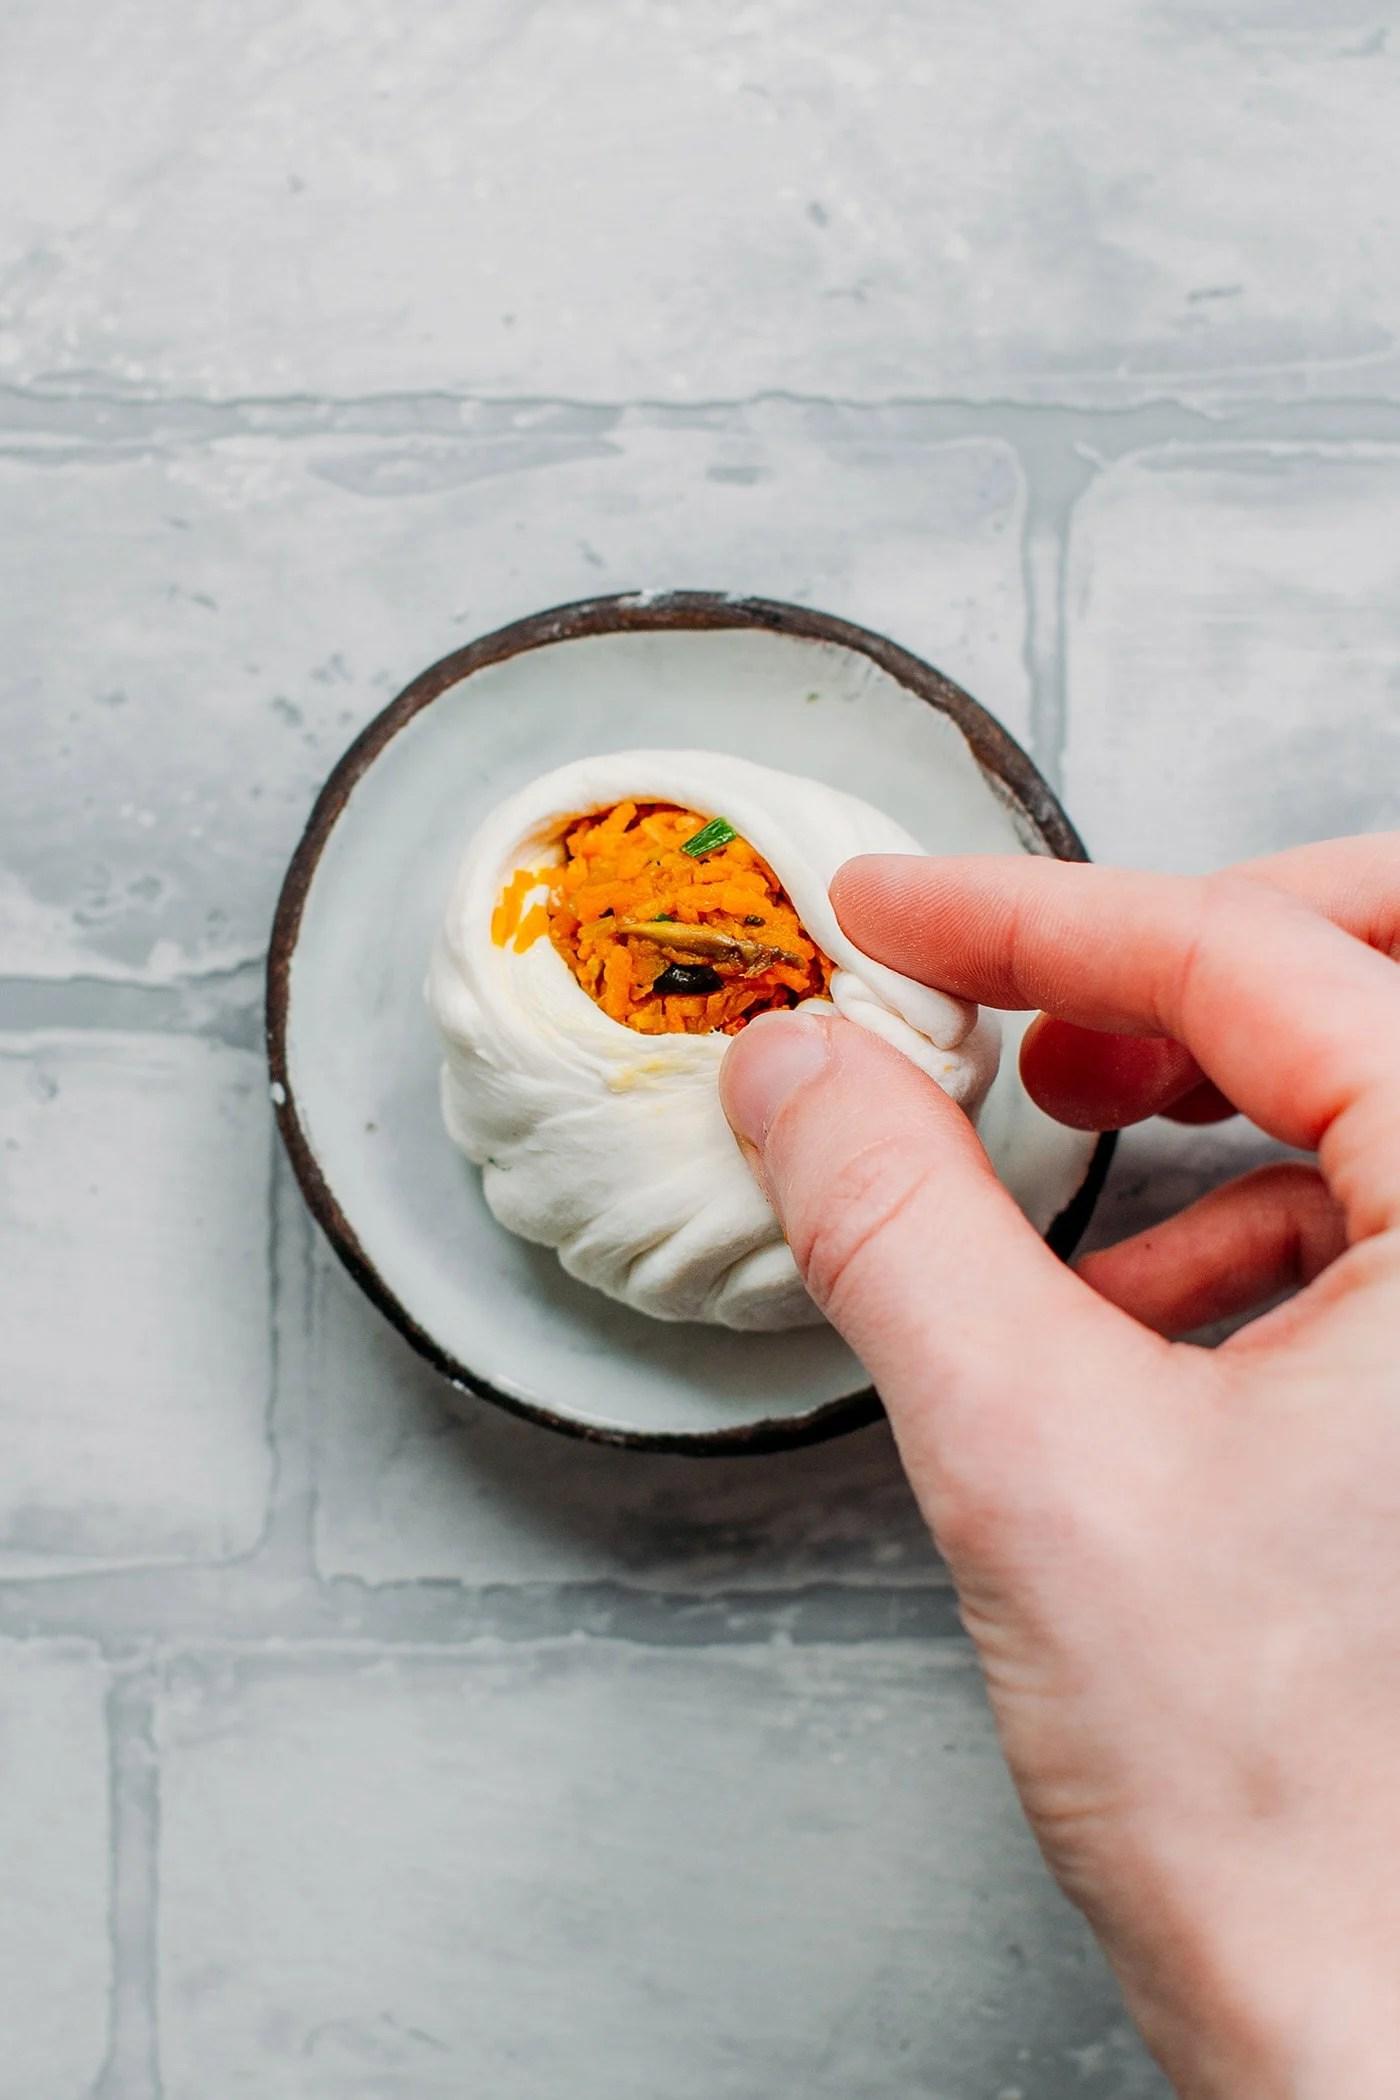 Sweet Potato Steamed Buns (Bao)